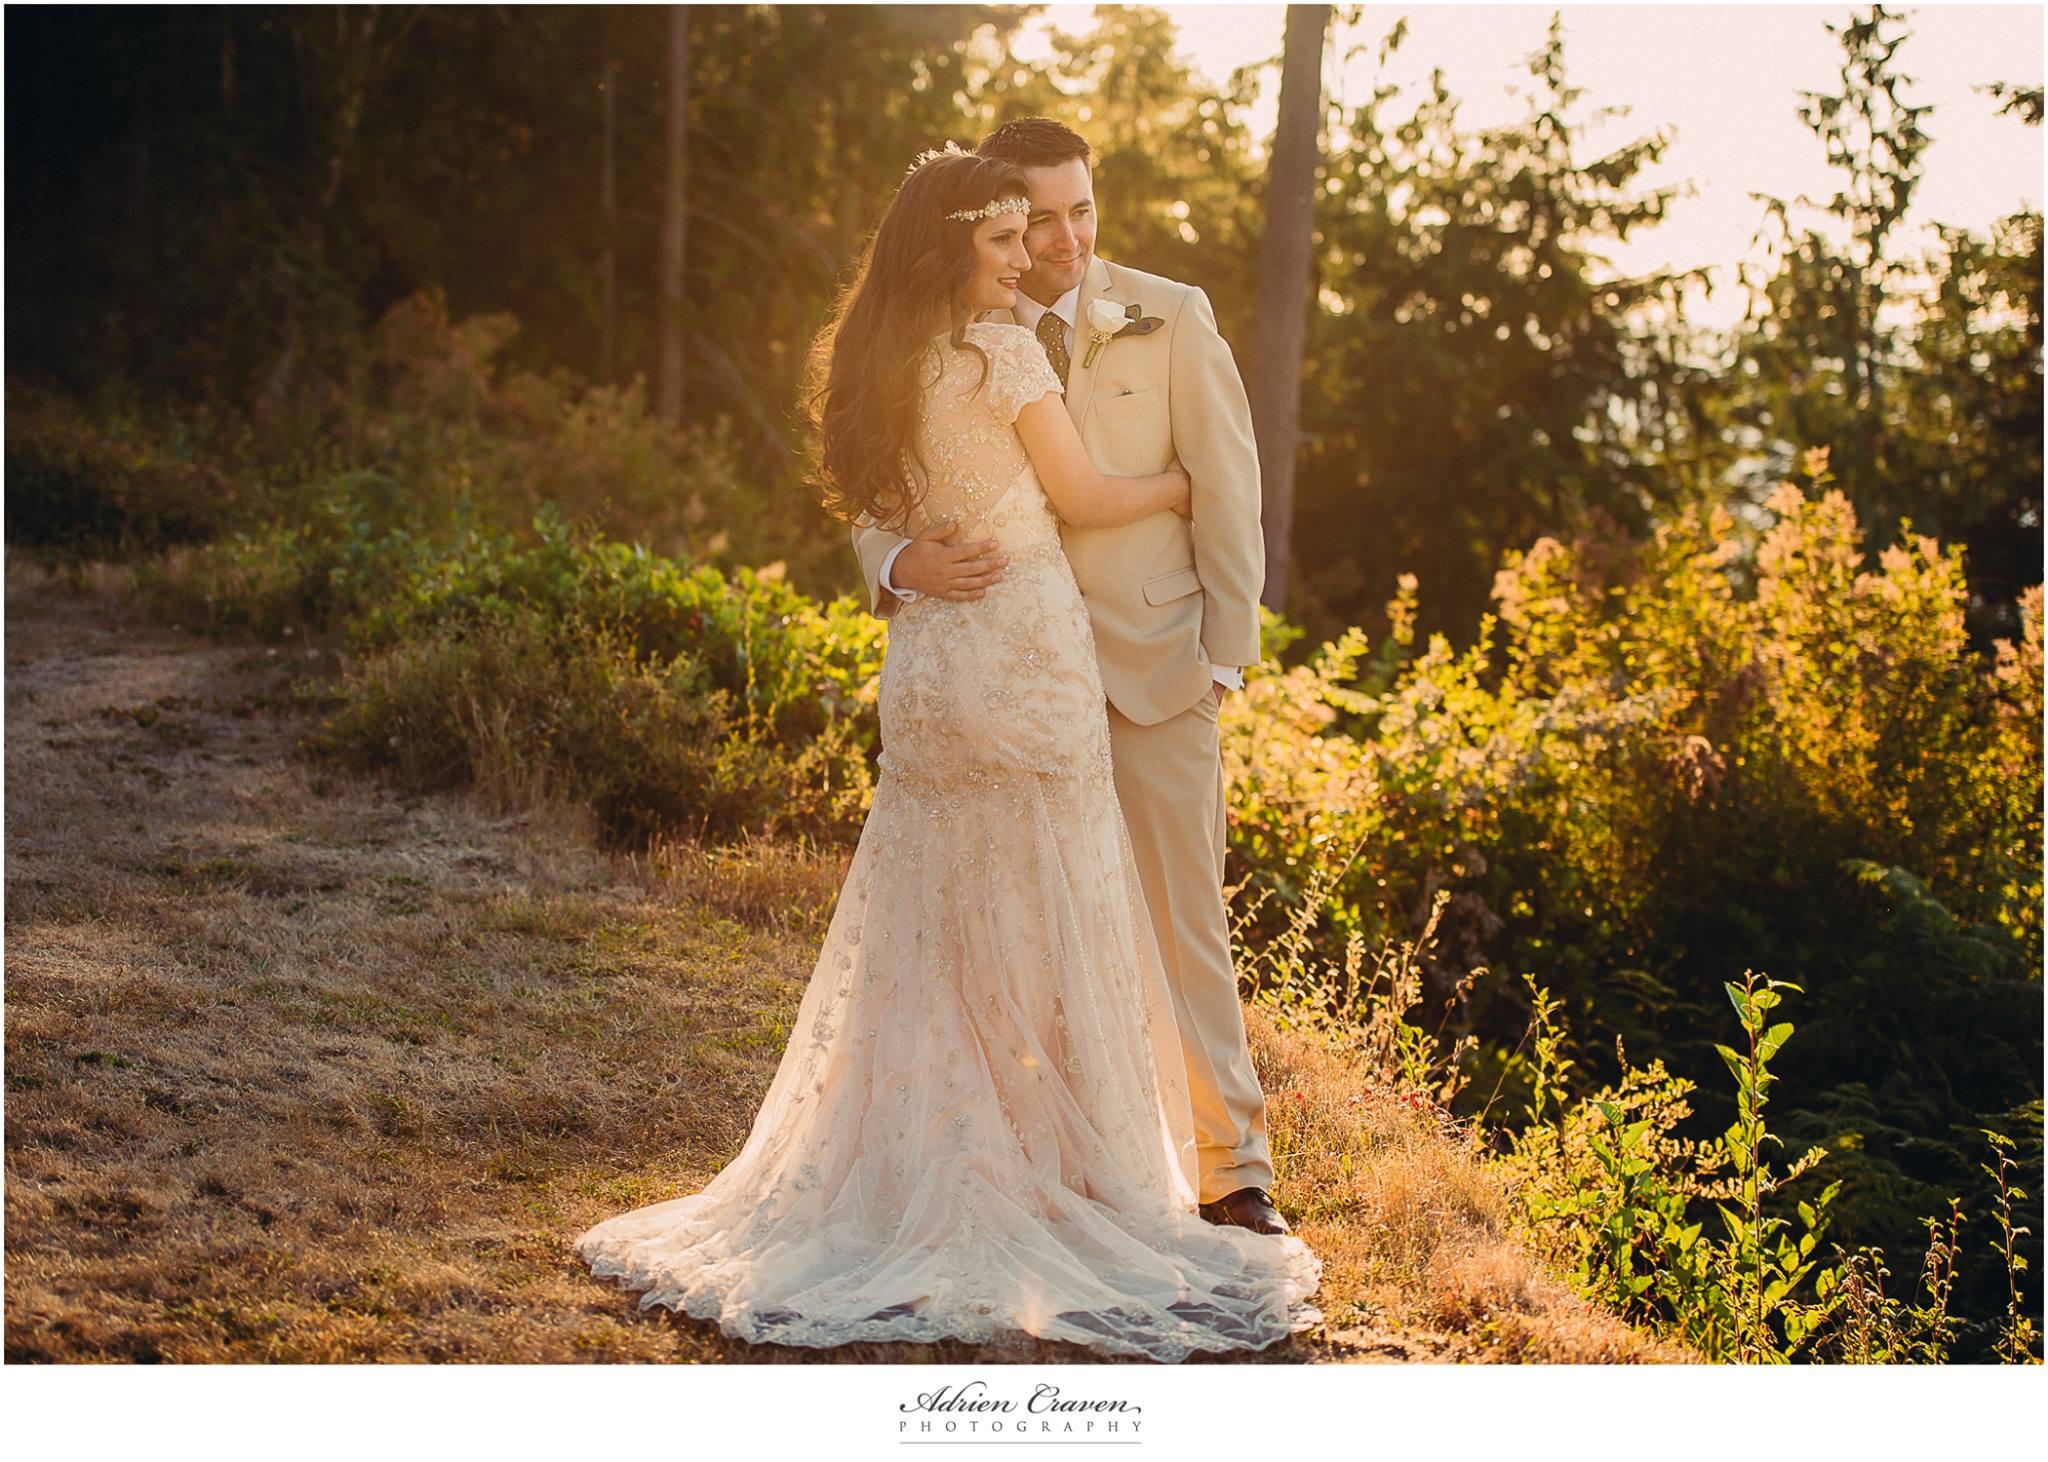 Maggie Sottero Wedding Dress Great Gatsby Inspired Diy Ideas Beautiful Outdoor